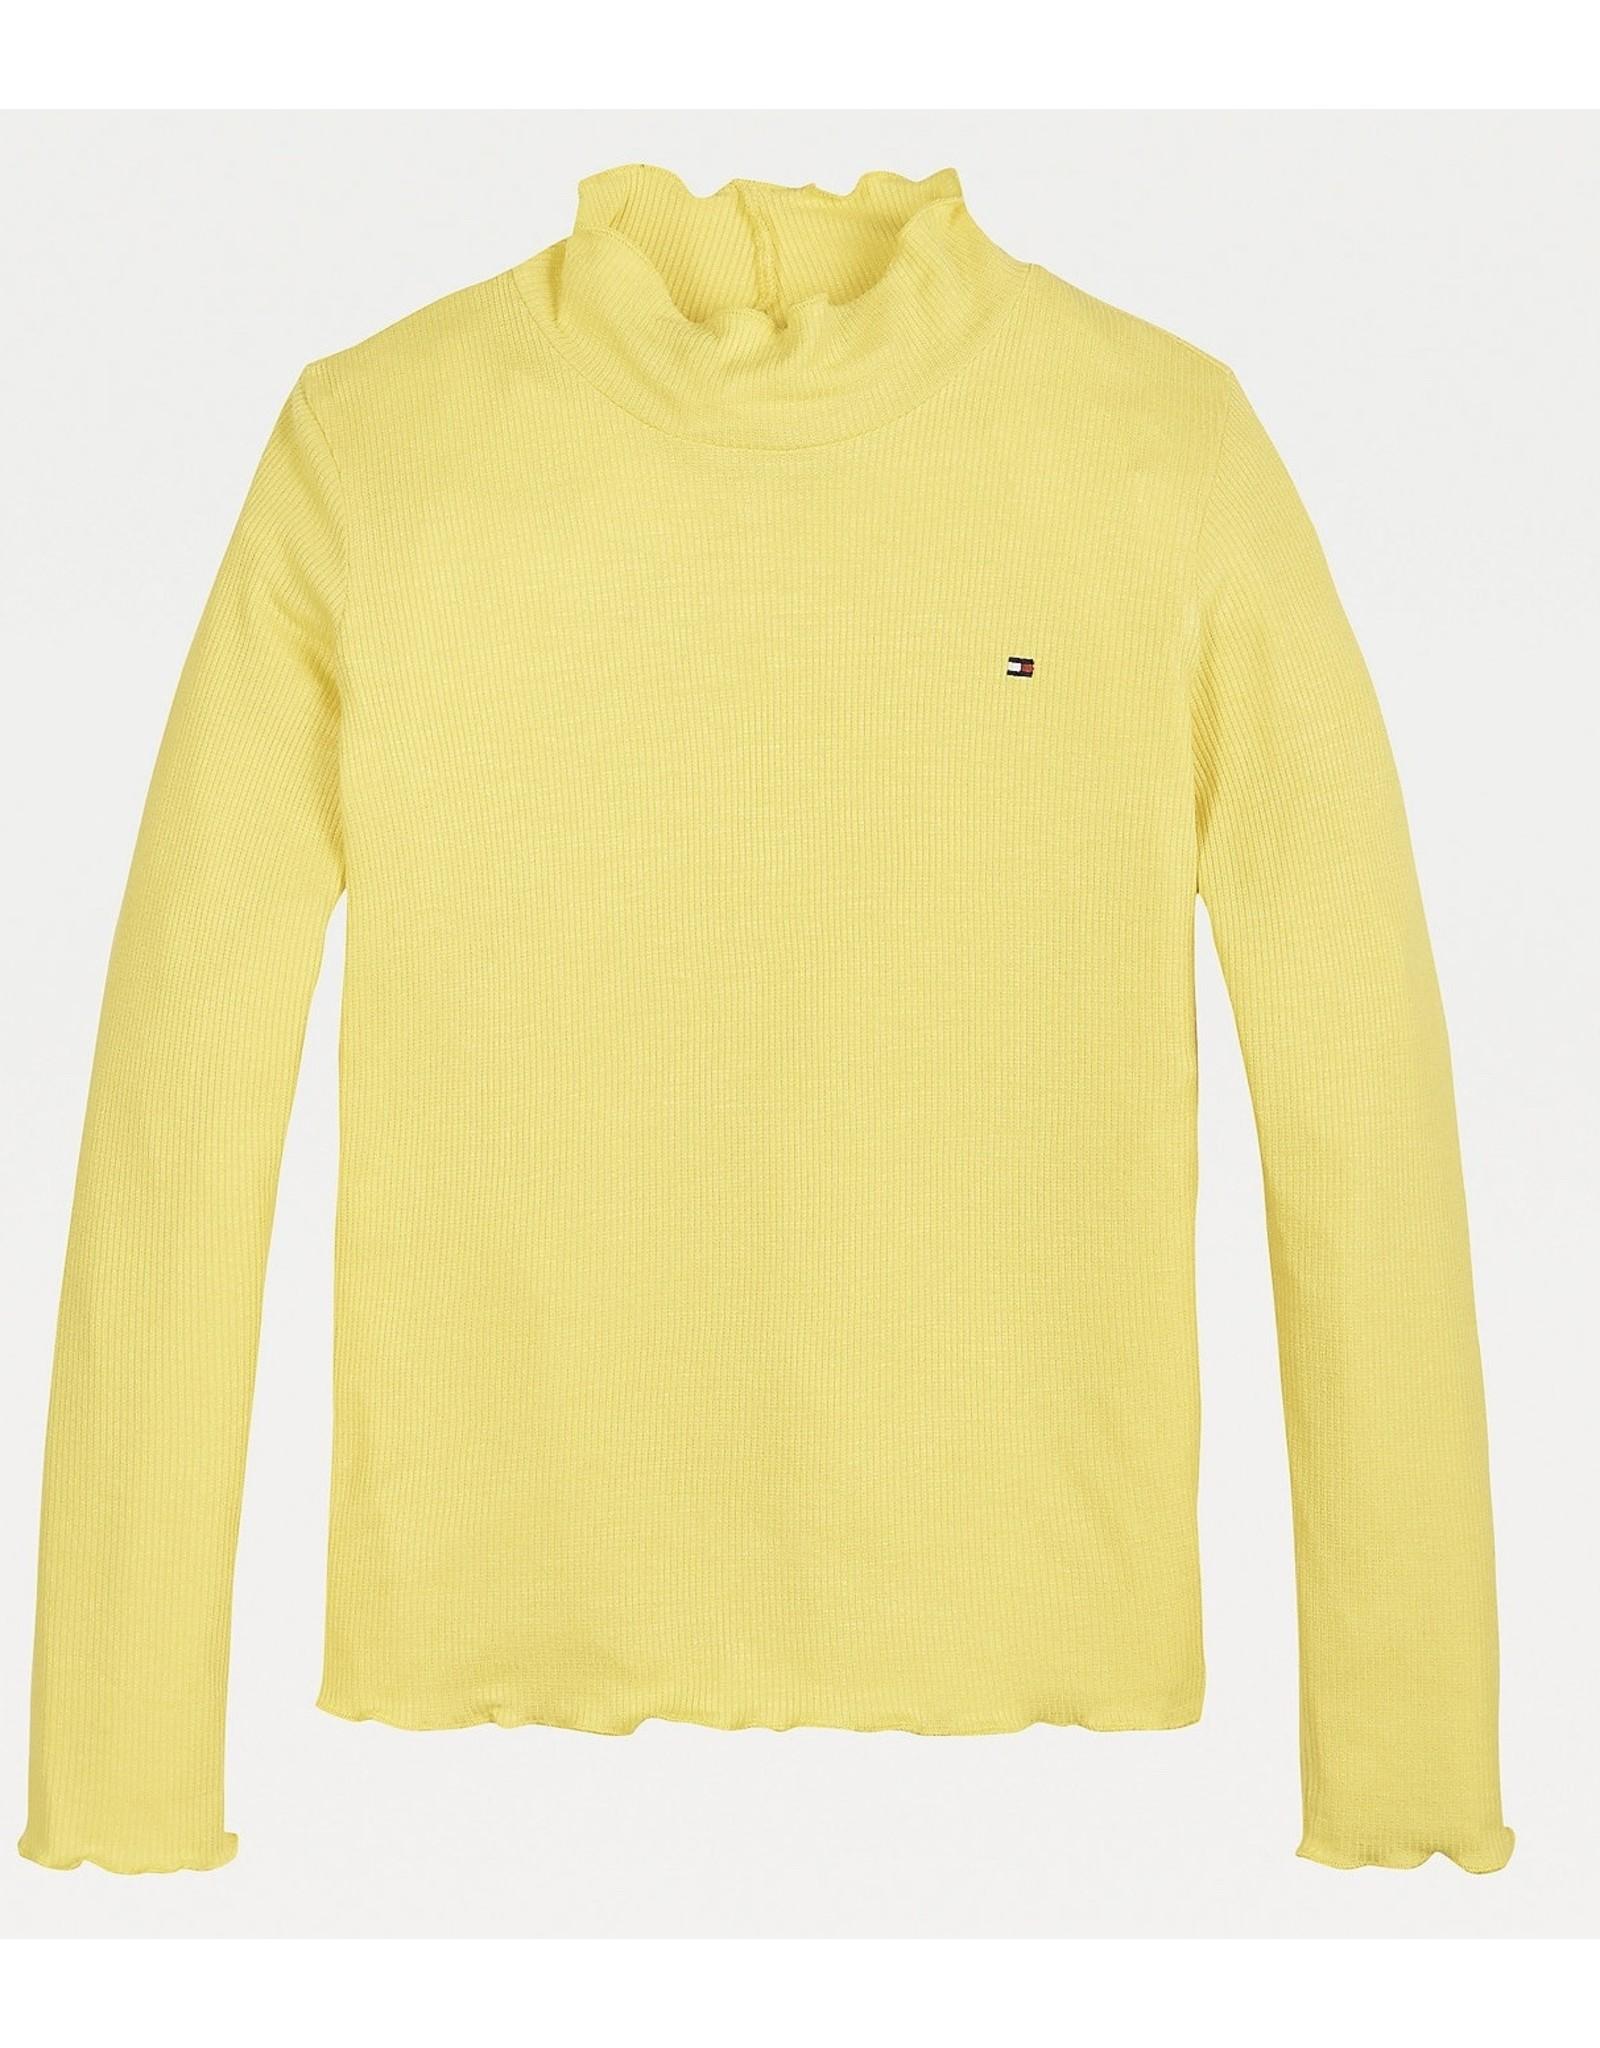 Tommy Hilfiger 05515 T-shirt